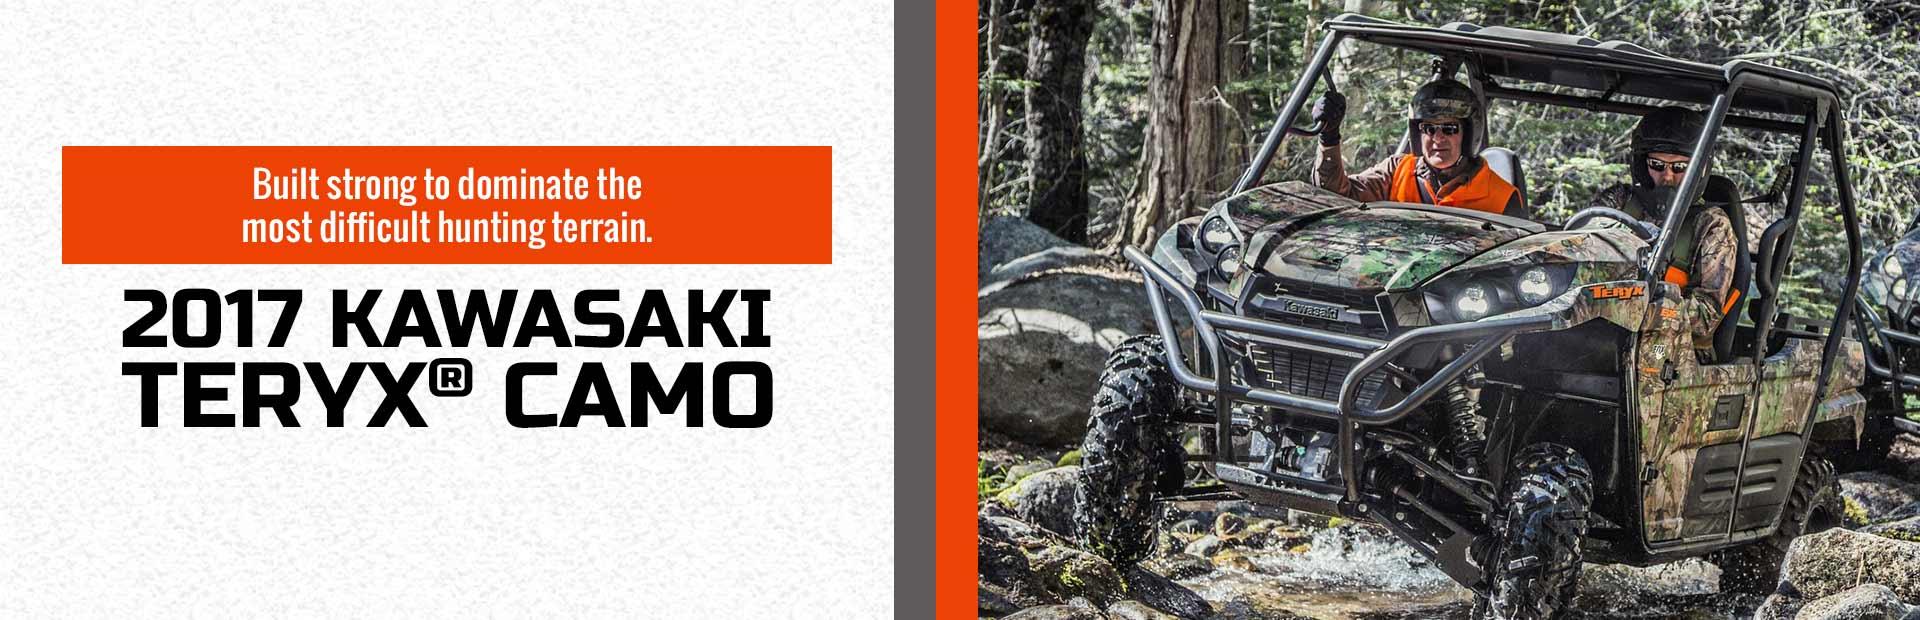 2017 Kawasaki Teryx® Camo: Click for details.